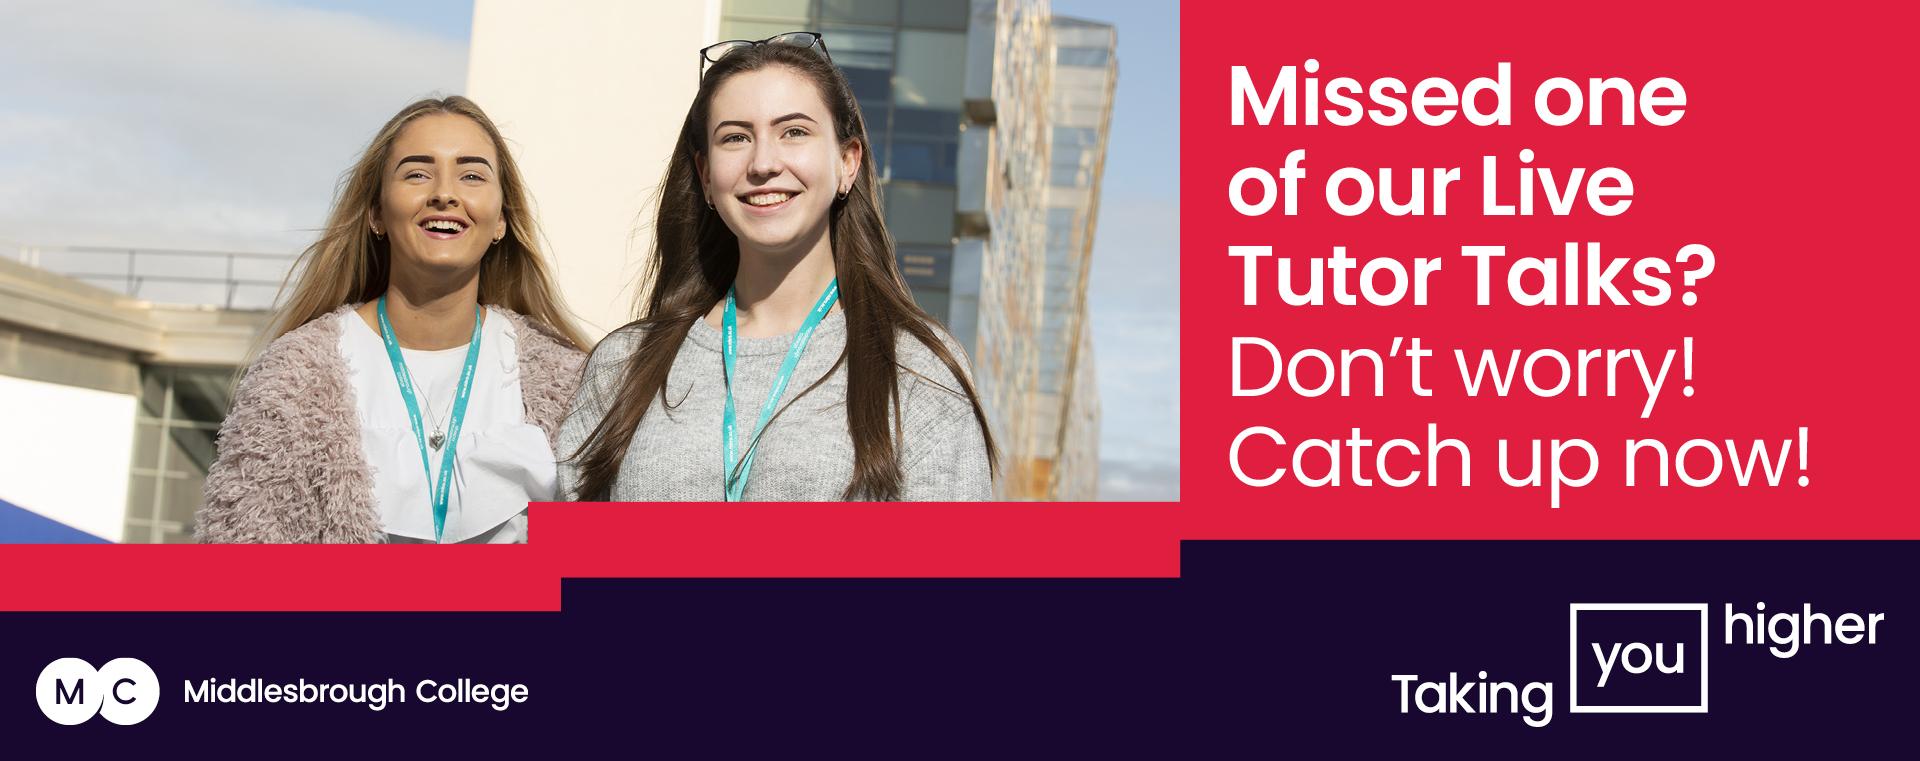 Middlesbrough College Live Tutor Talks